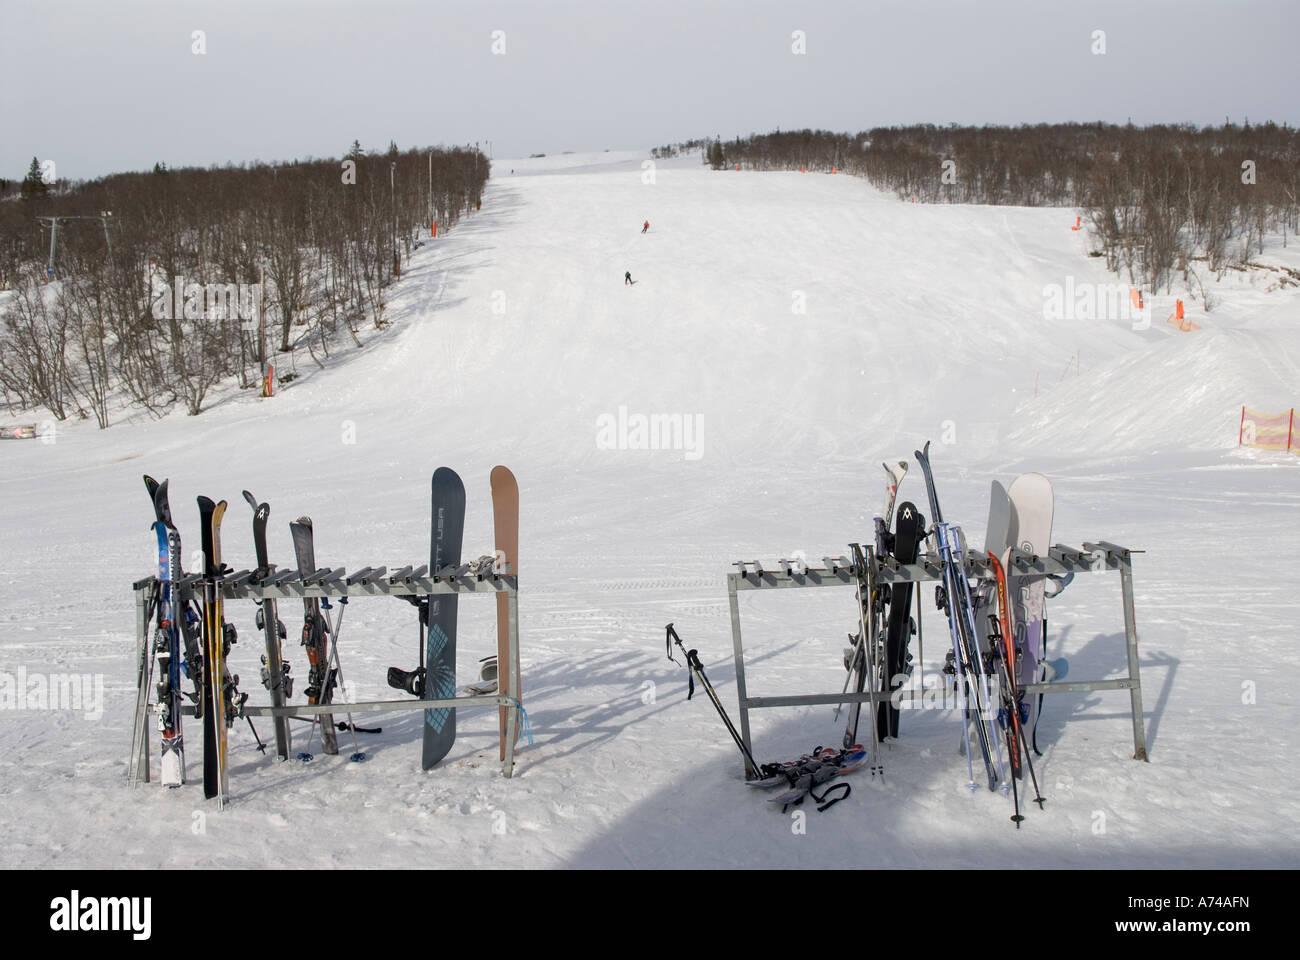 skislope in storlien, sweden stock photo: 11719640 - alamy